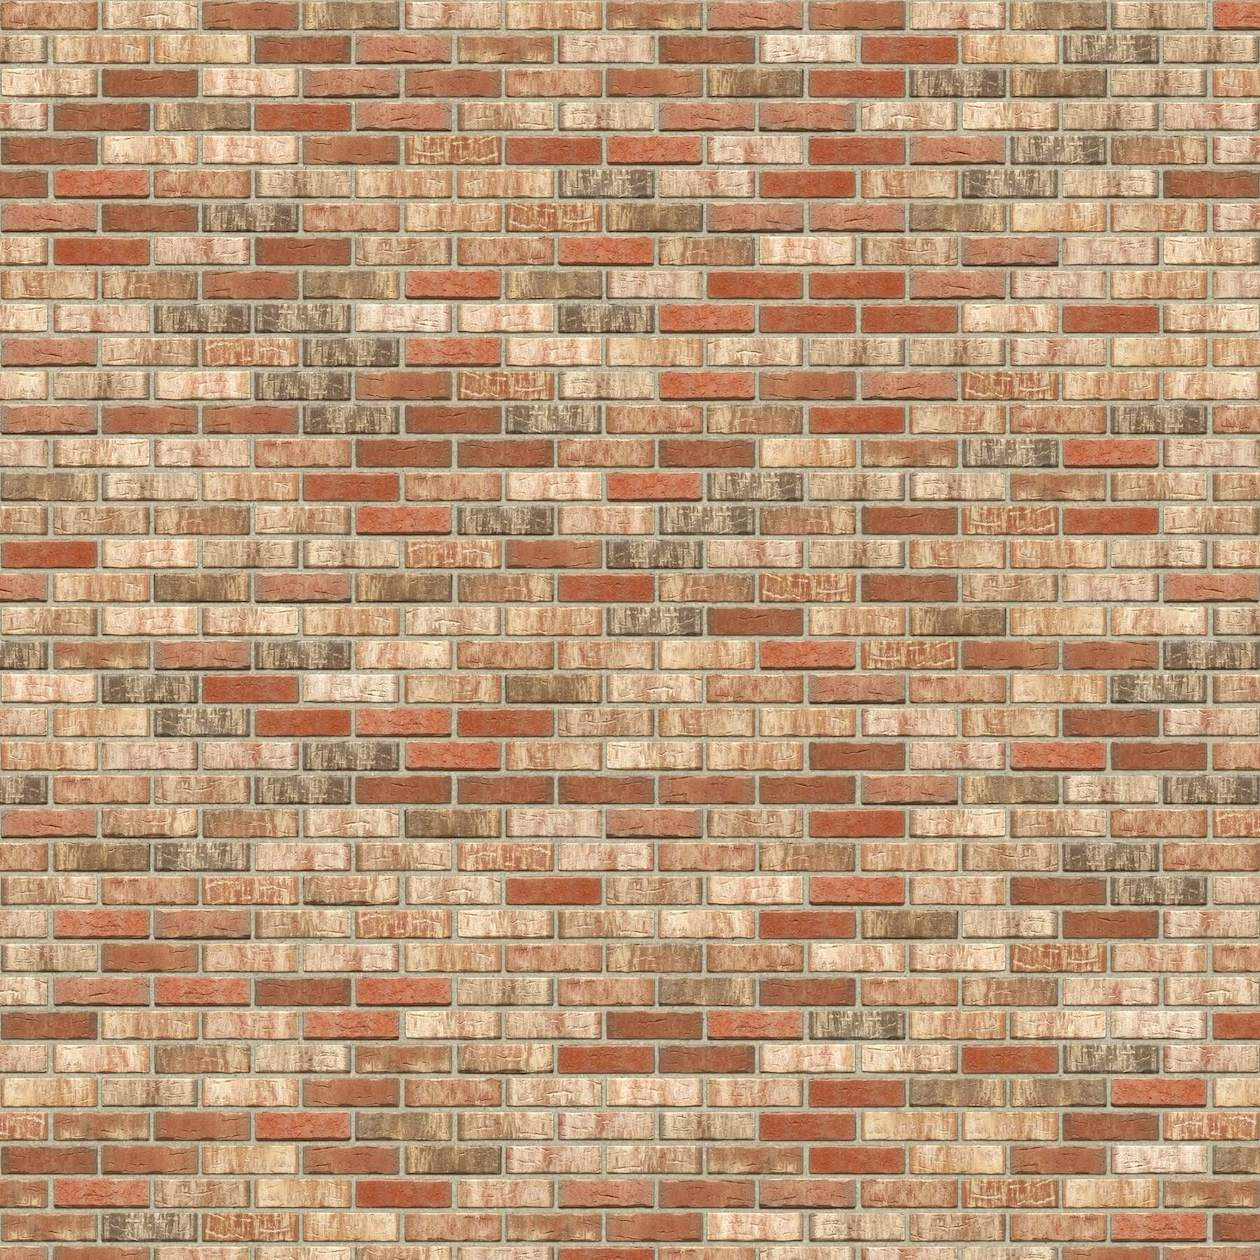 Puna-cigla-FeldHaus-Klinker-brick-house-nf-k-690-Bez Fuga